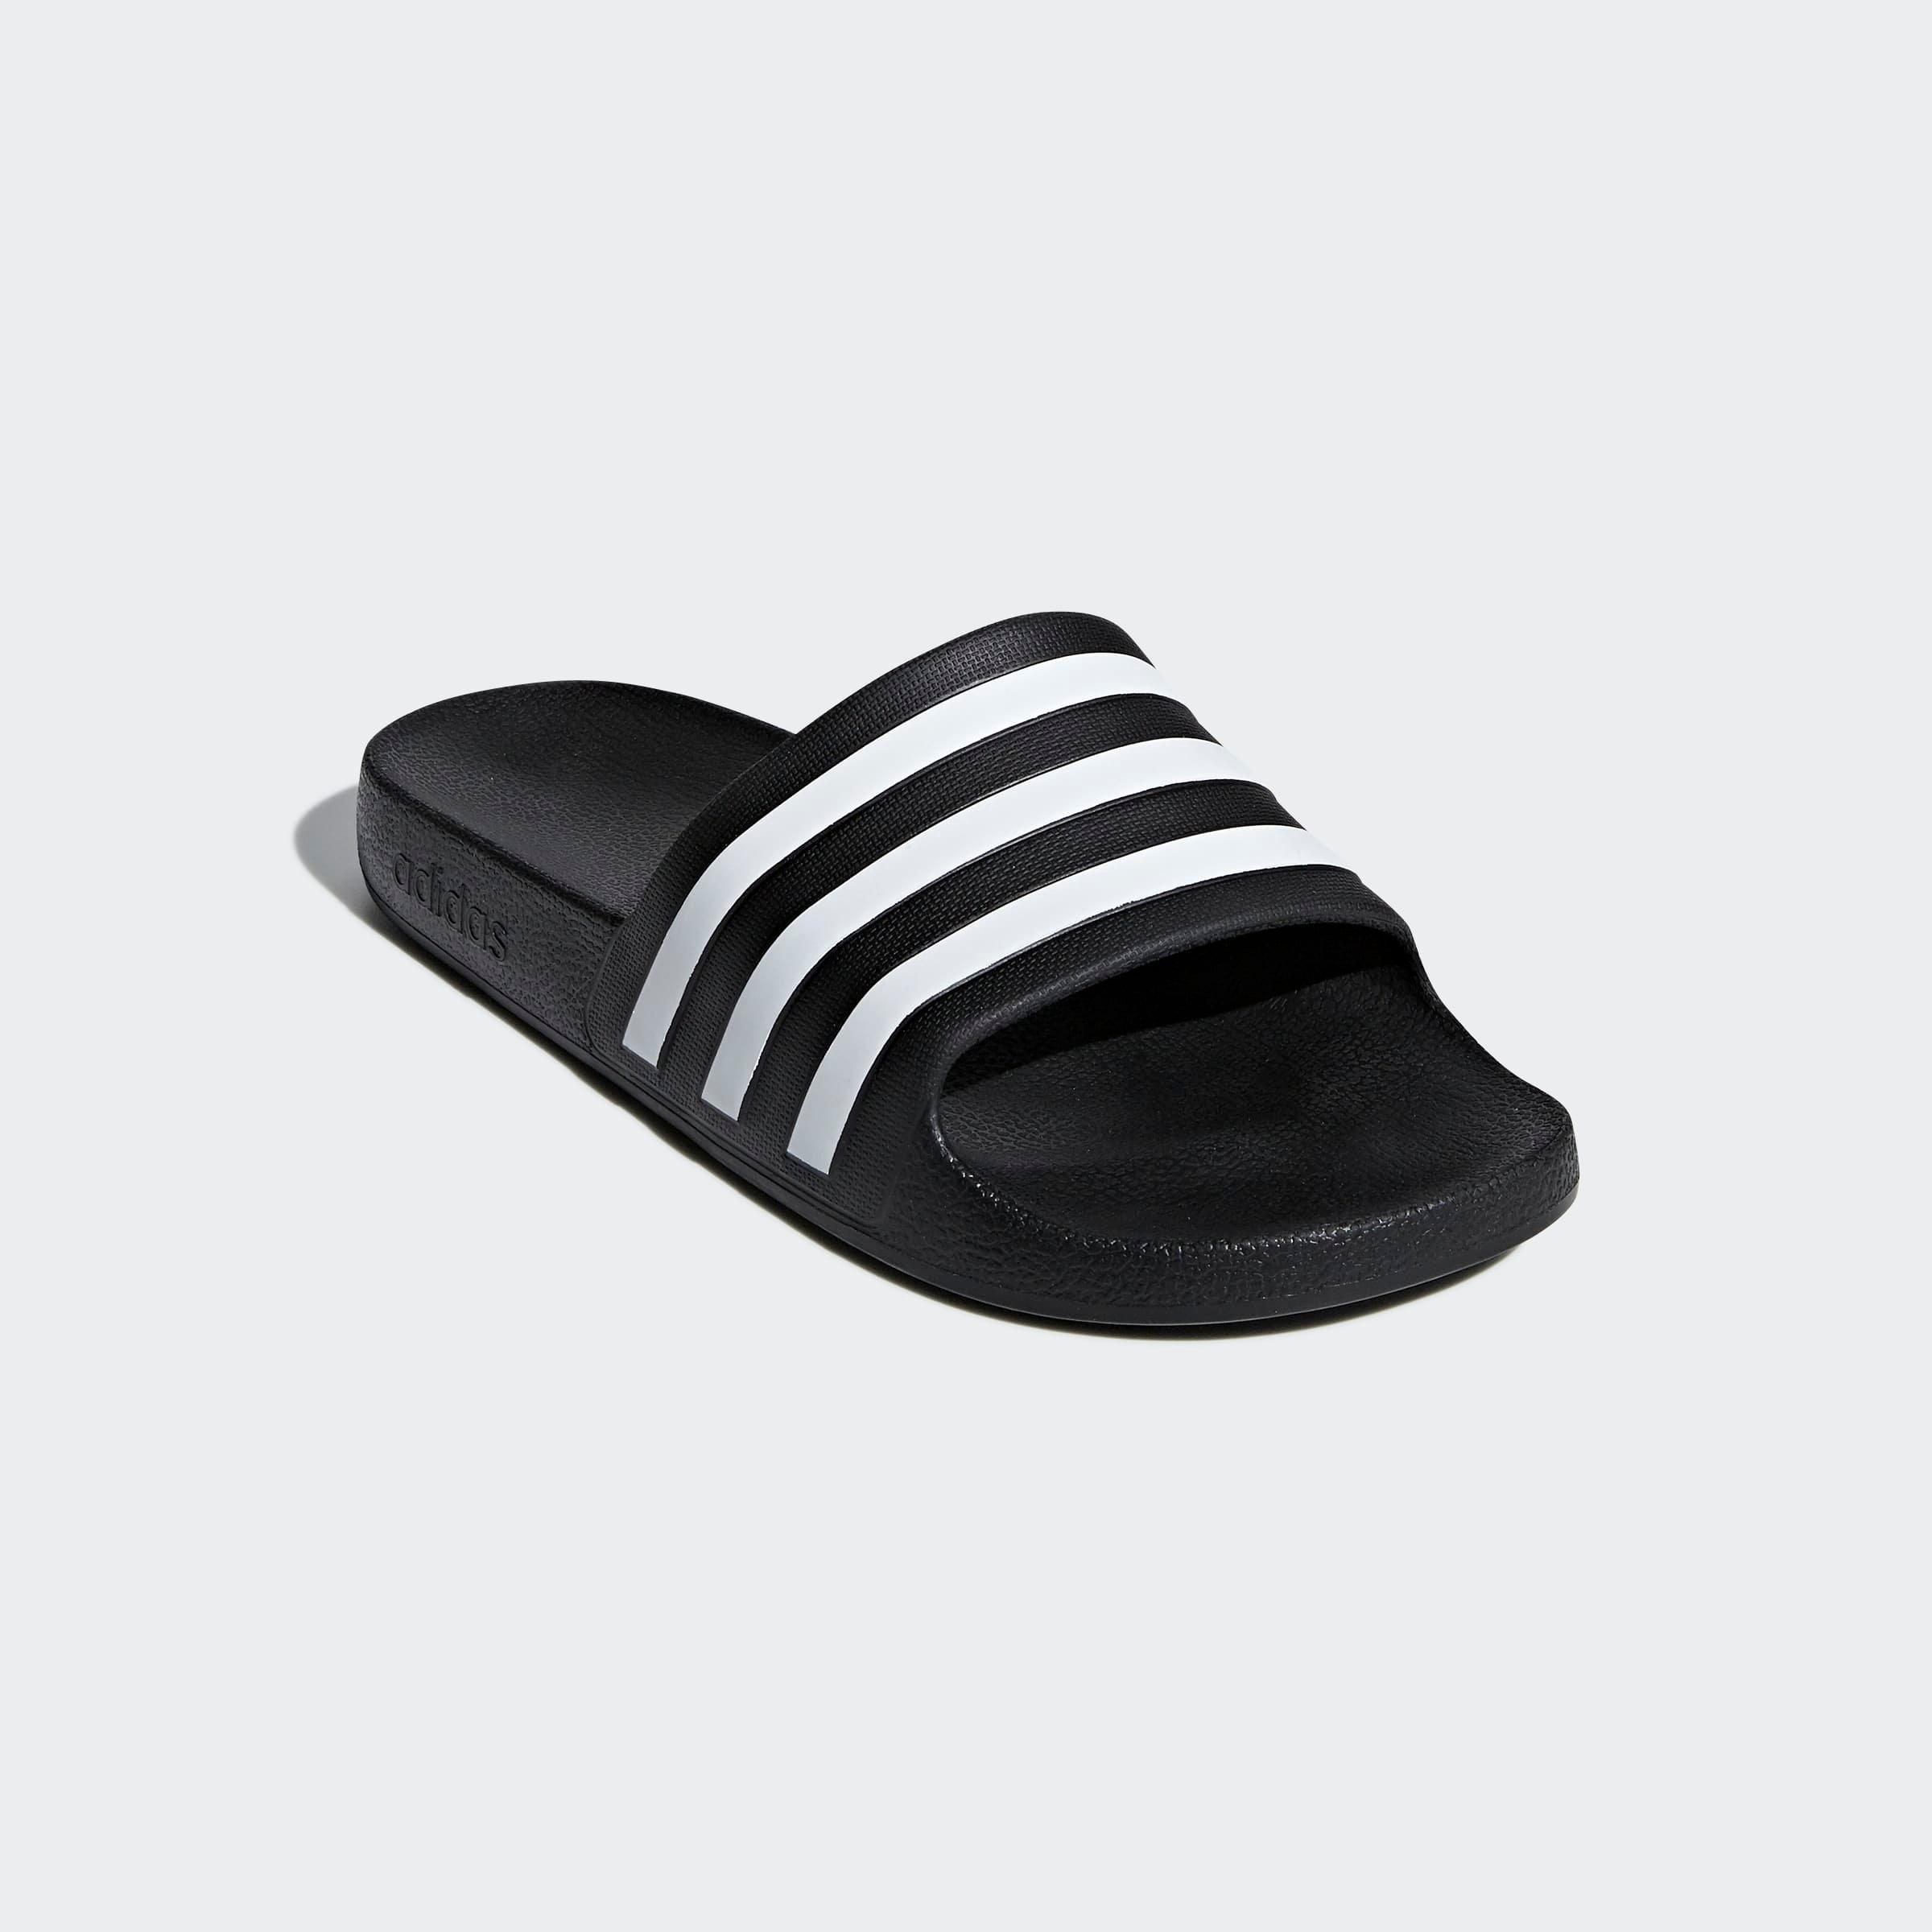 adidas Badslippers AQUA ADILETTE nu online bestellen